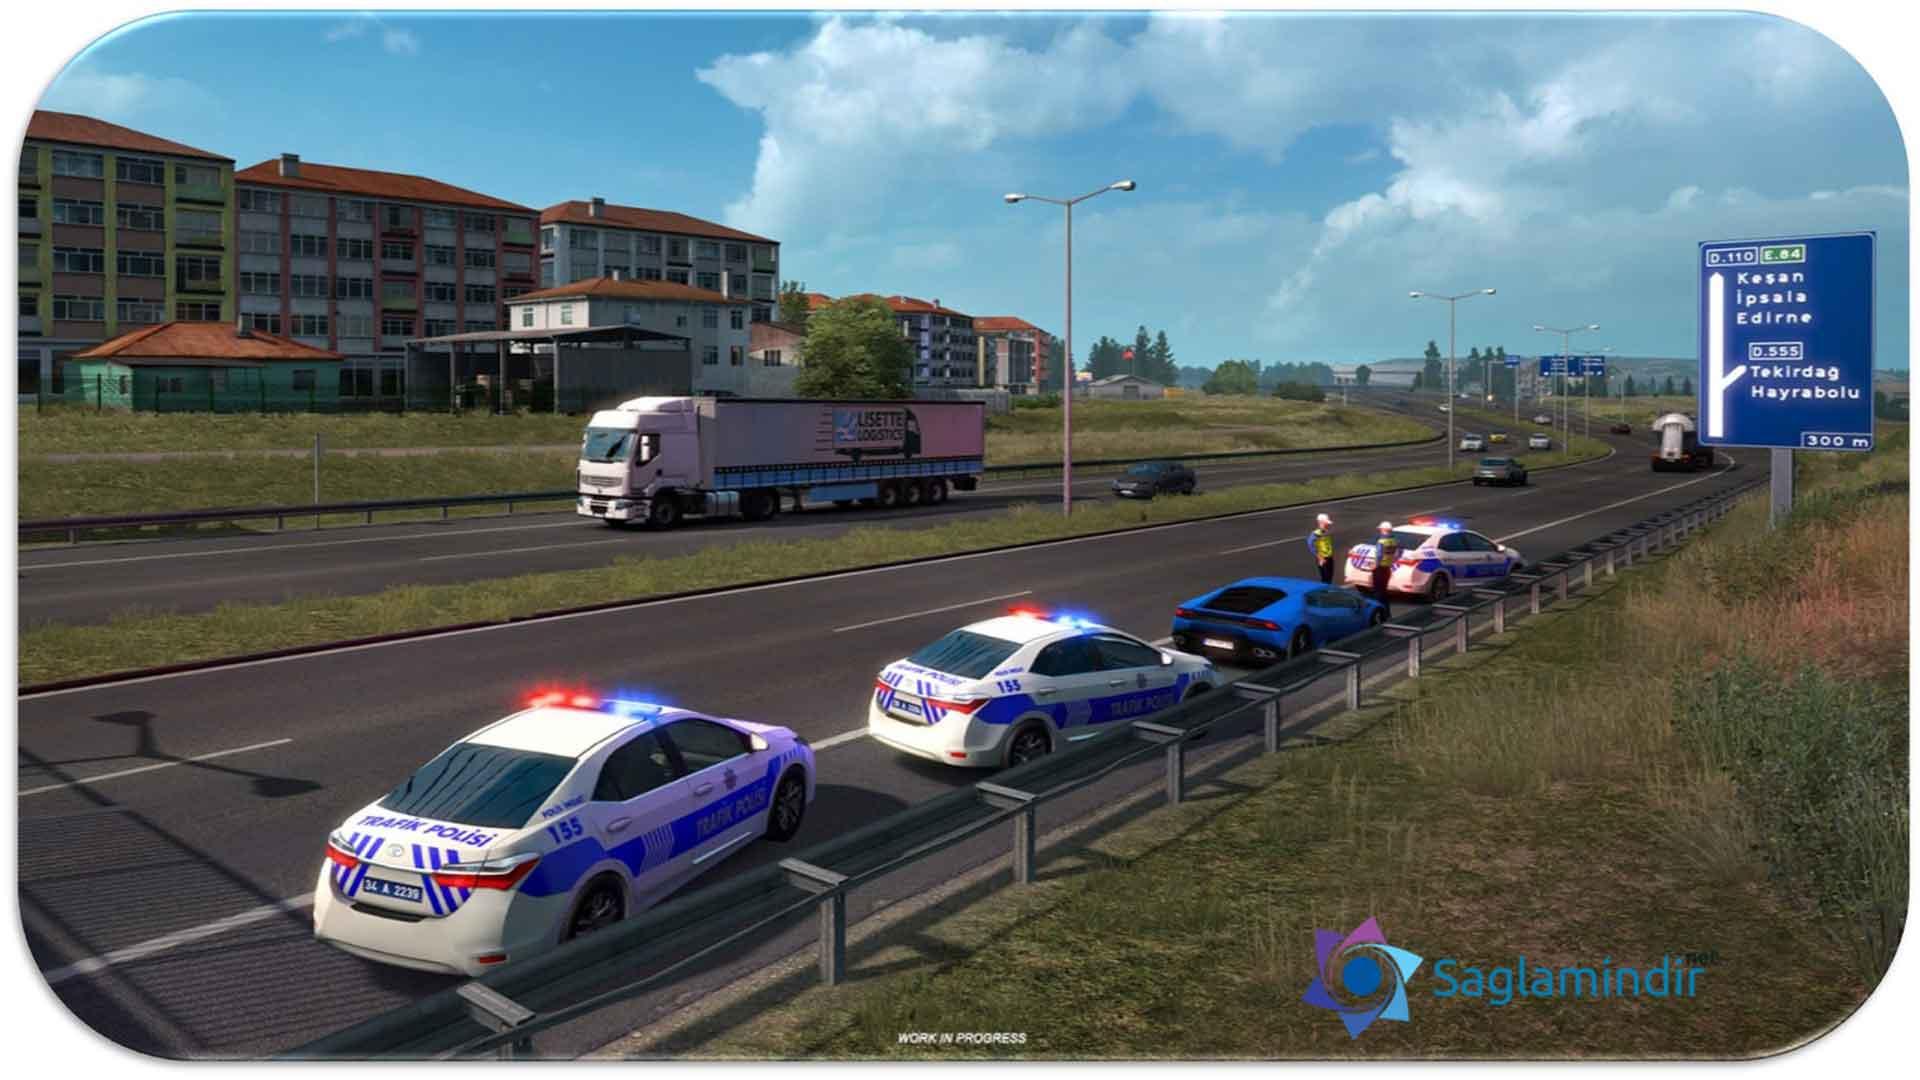 euro truck simulator 2 road to black sea saglamindir